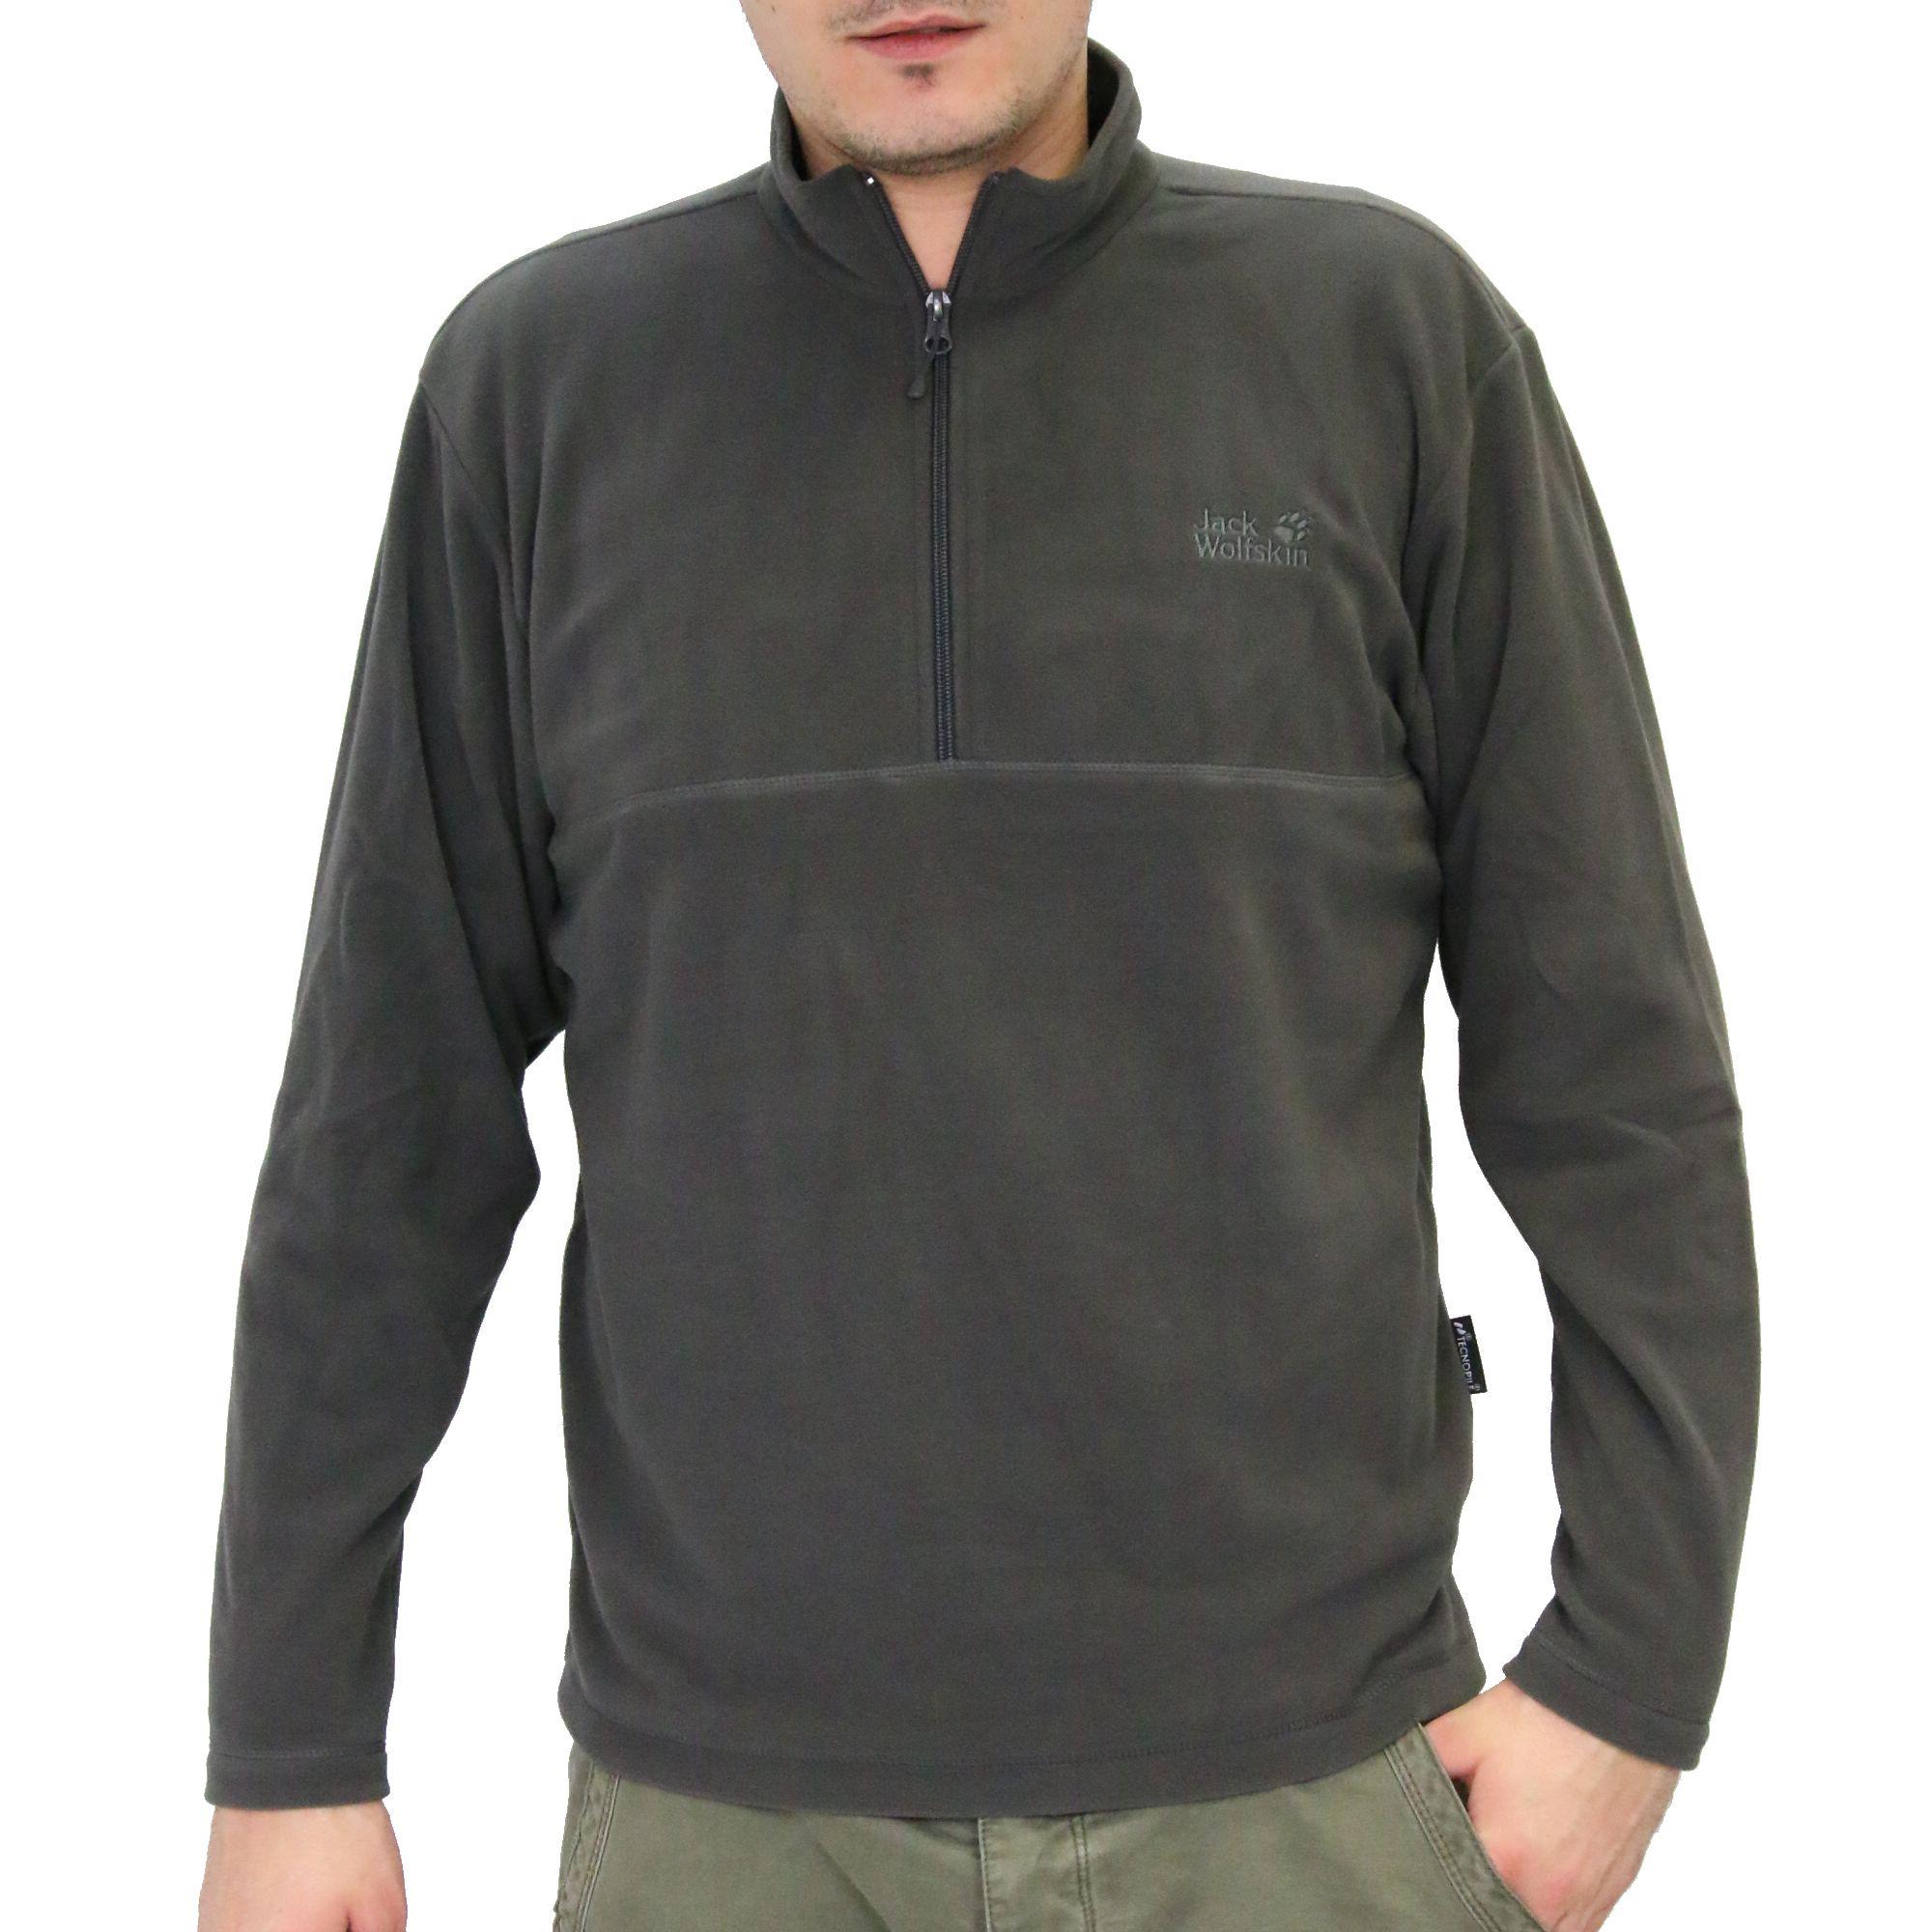 jack wolfskin gecko fleece jacket fleece sweater outdoor. Black Bedroom Furniture Sets. Home Design Ideas